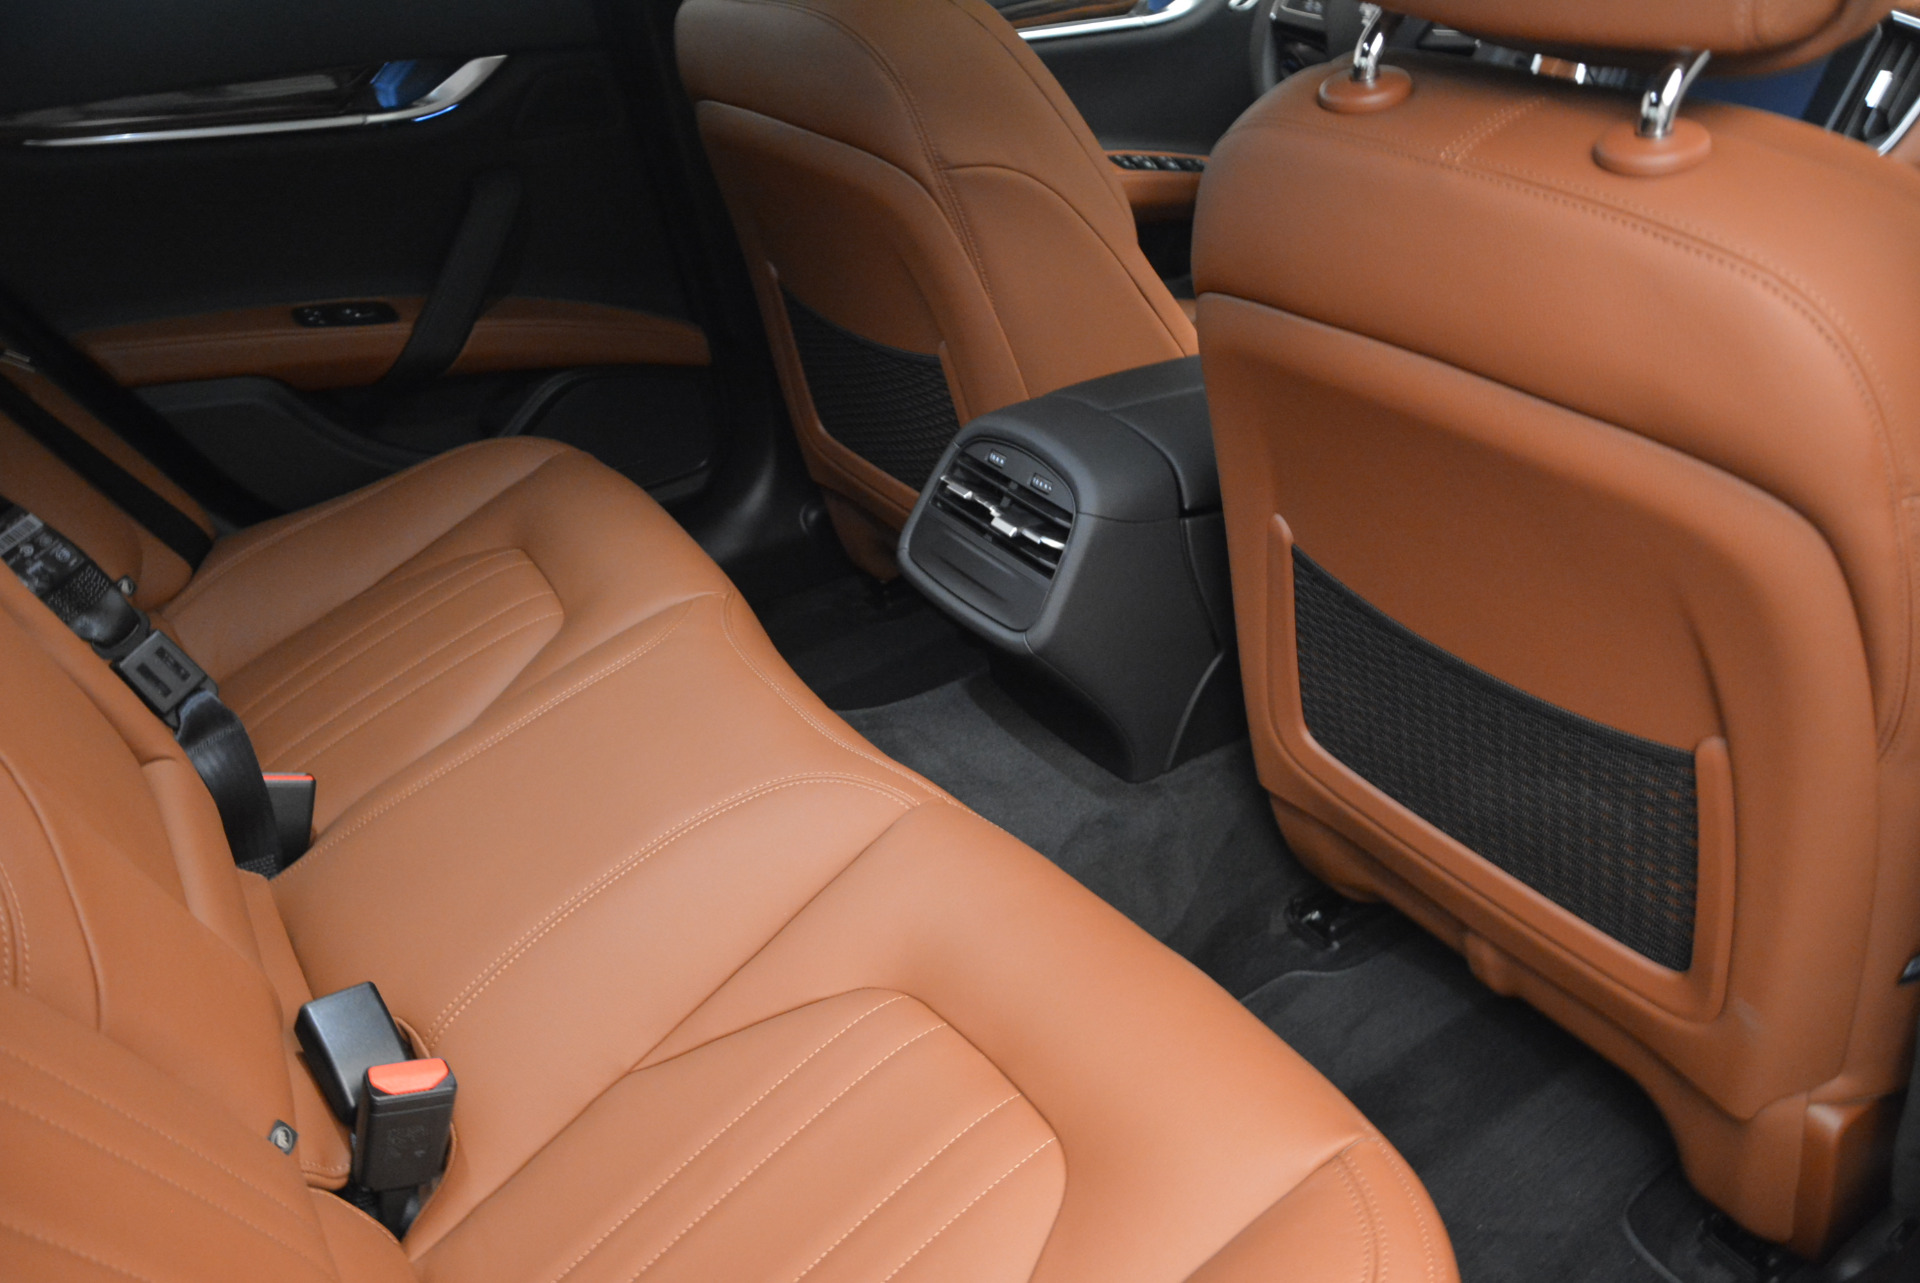 Used 2017 Maserati Ghibli S Q4 - EX Loaner For Sale In Greenwich, CT 568_p22